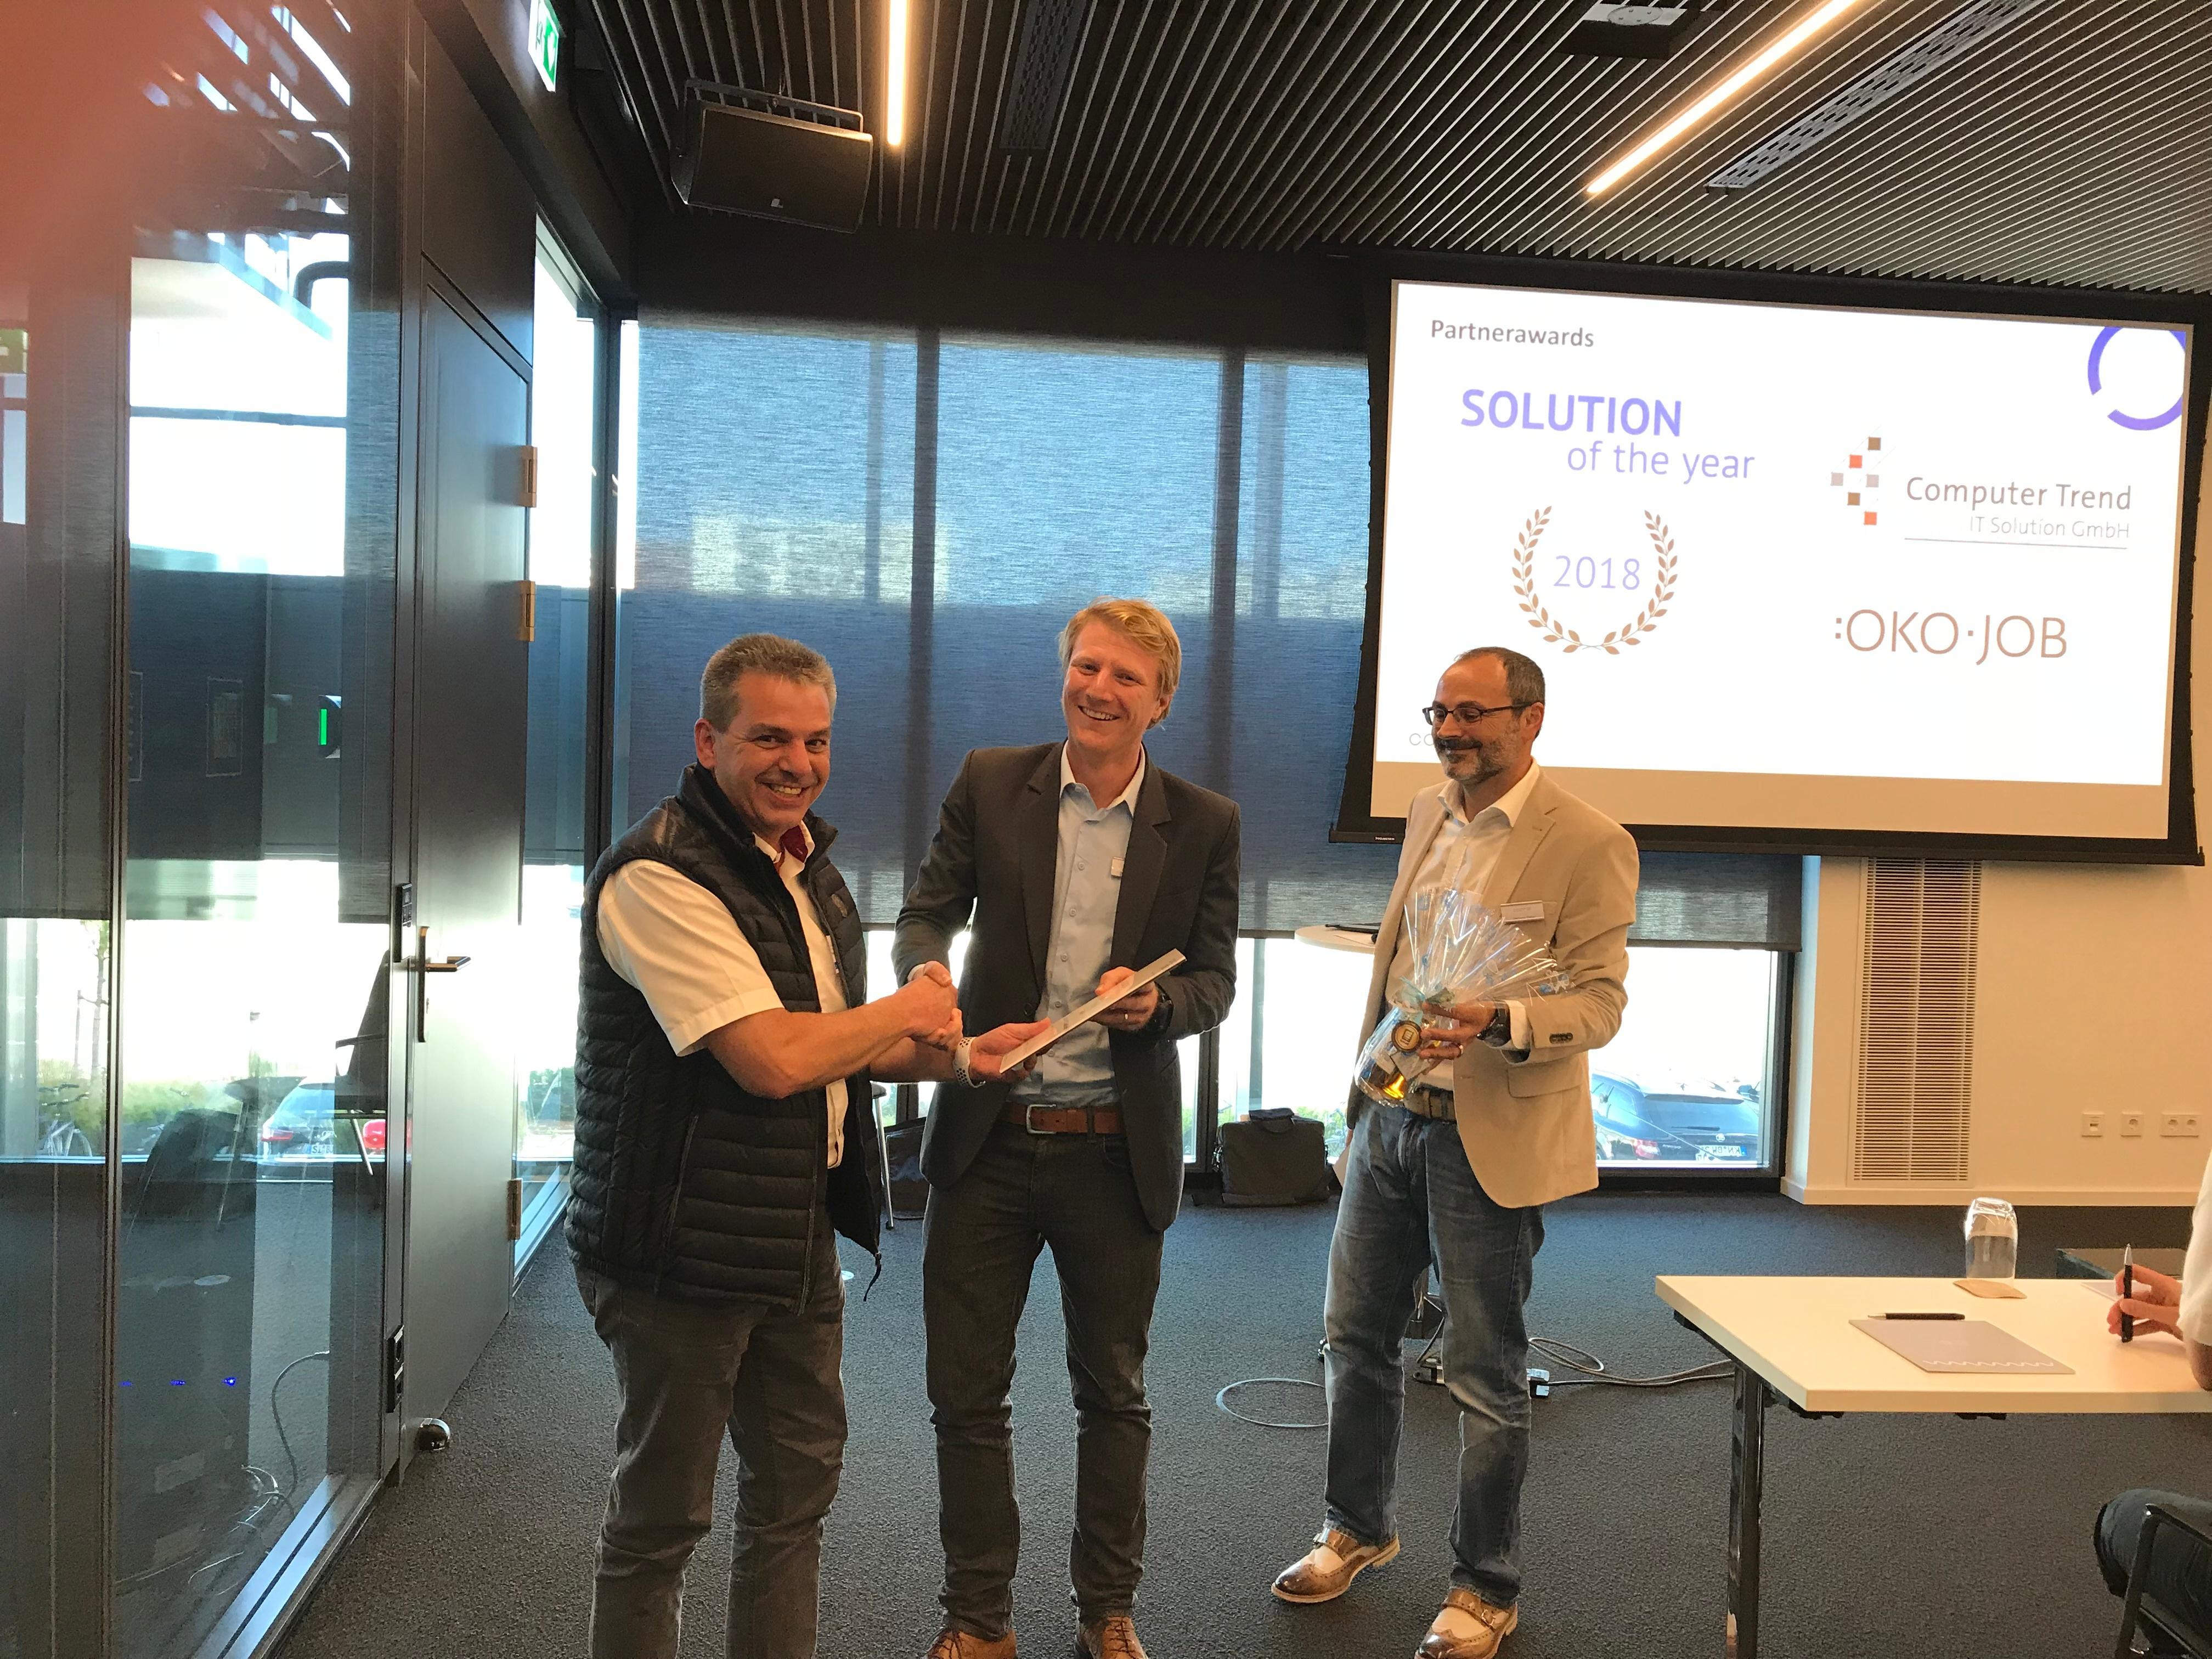 cobra-Partnertreffen 2018 in Konstanz